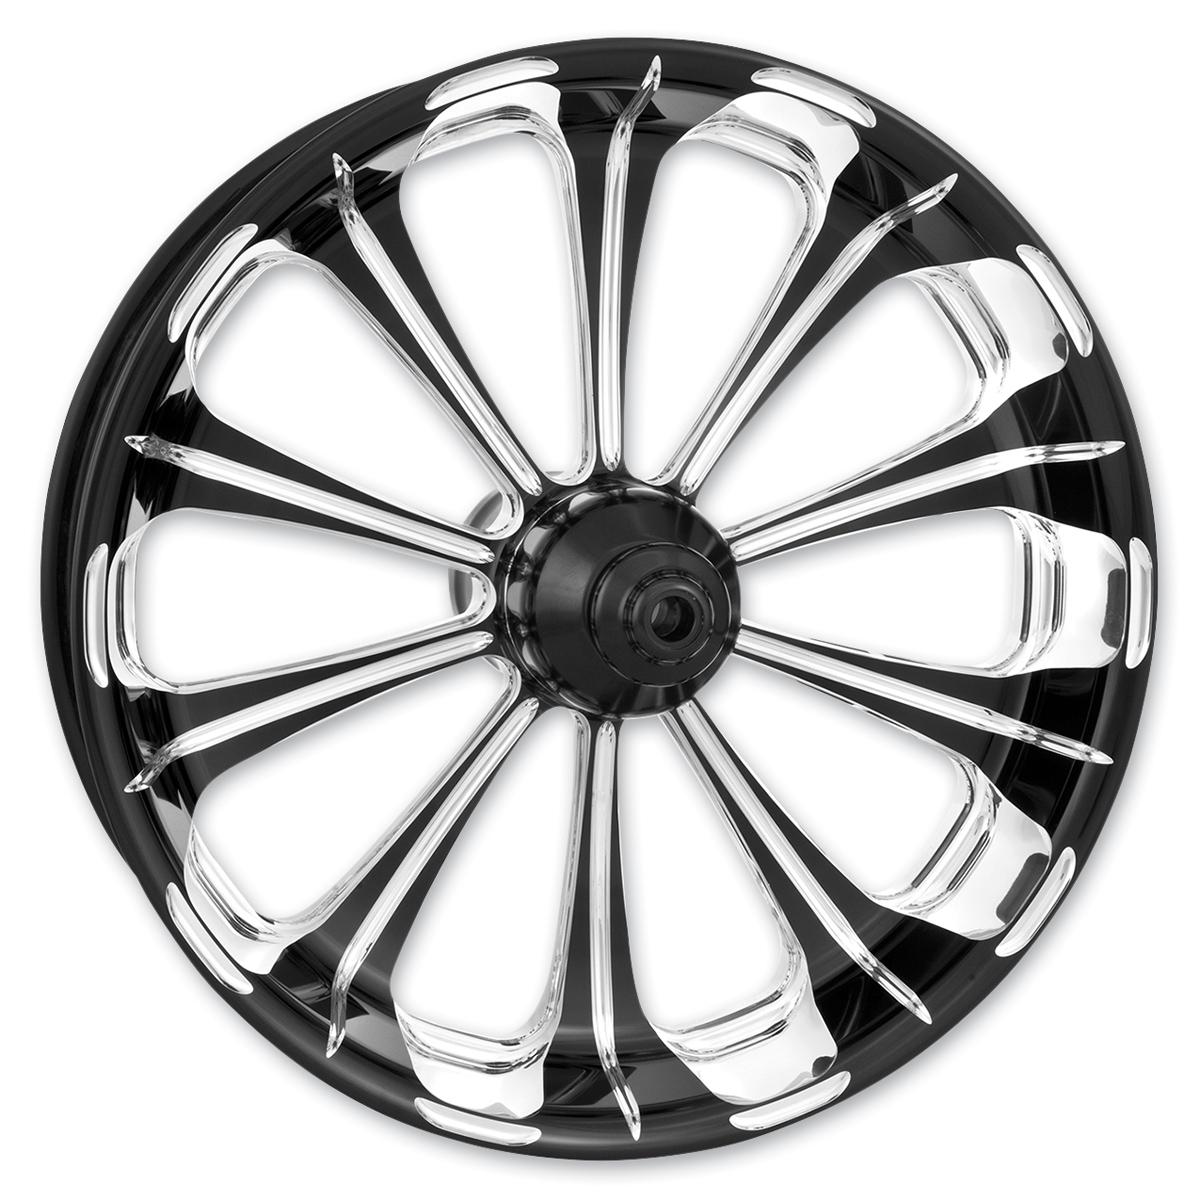 Performance Machine Revel Platinum Cut Front Wheel 21x3.5 Non-ABS